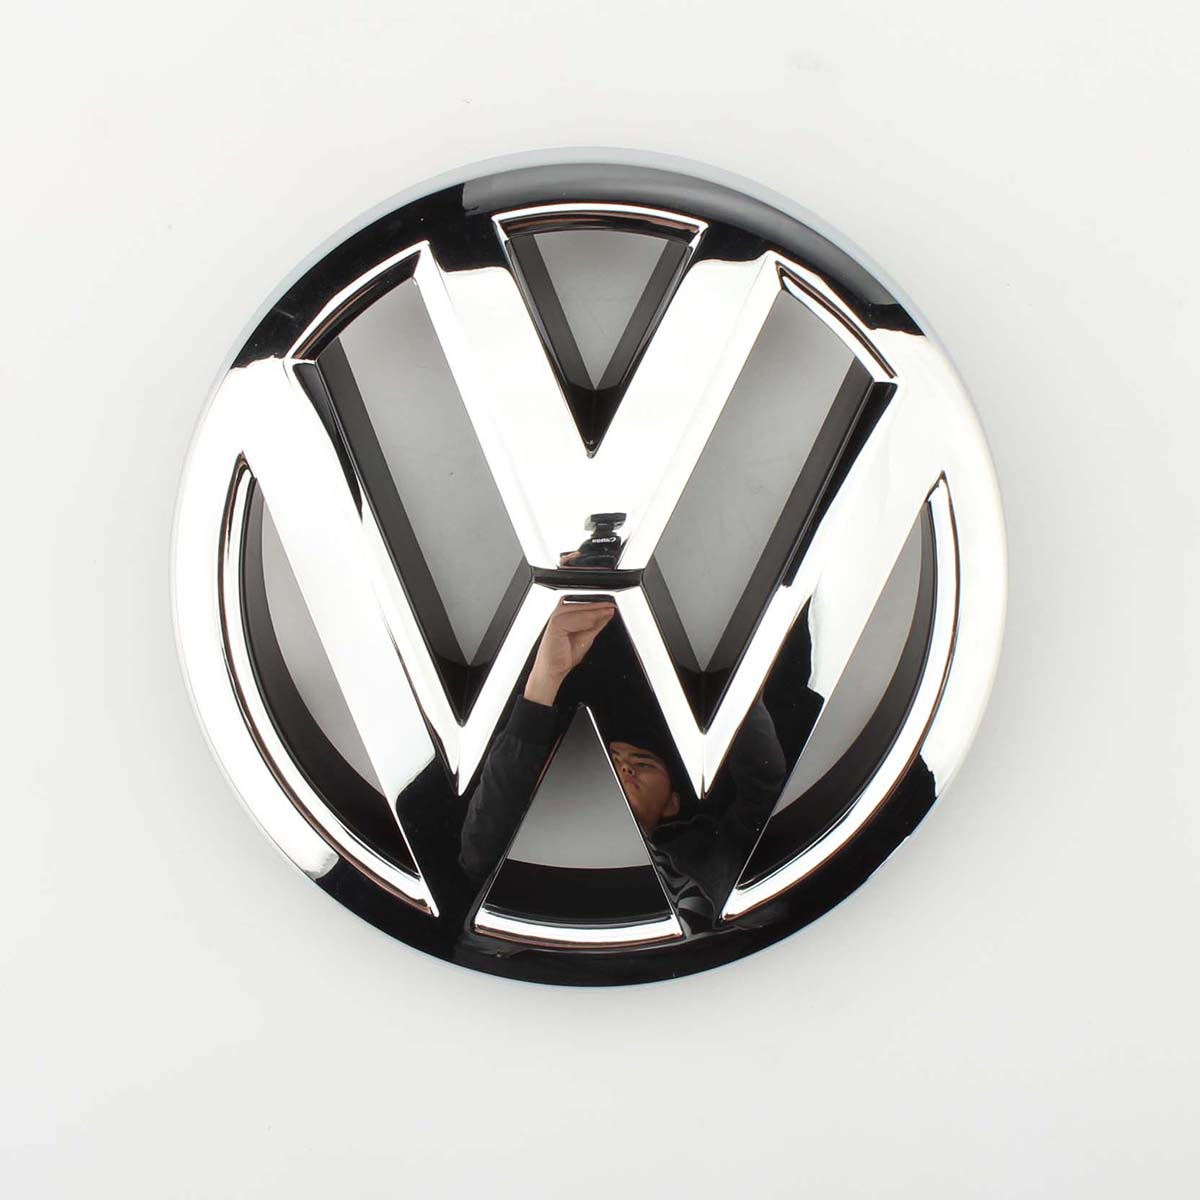 vw emblem chrome oem front grille badge jetta mk sedan   culm  emblems